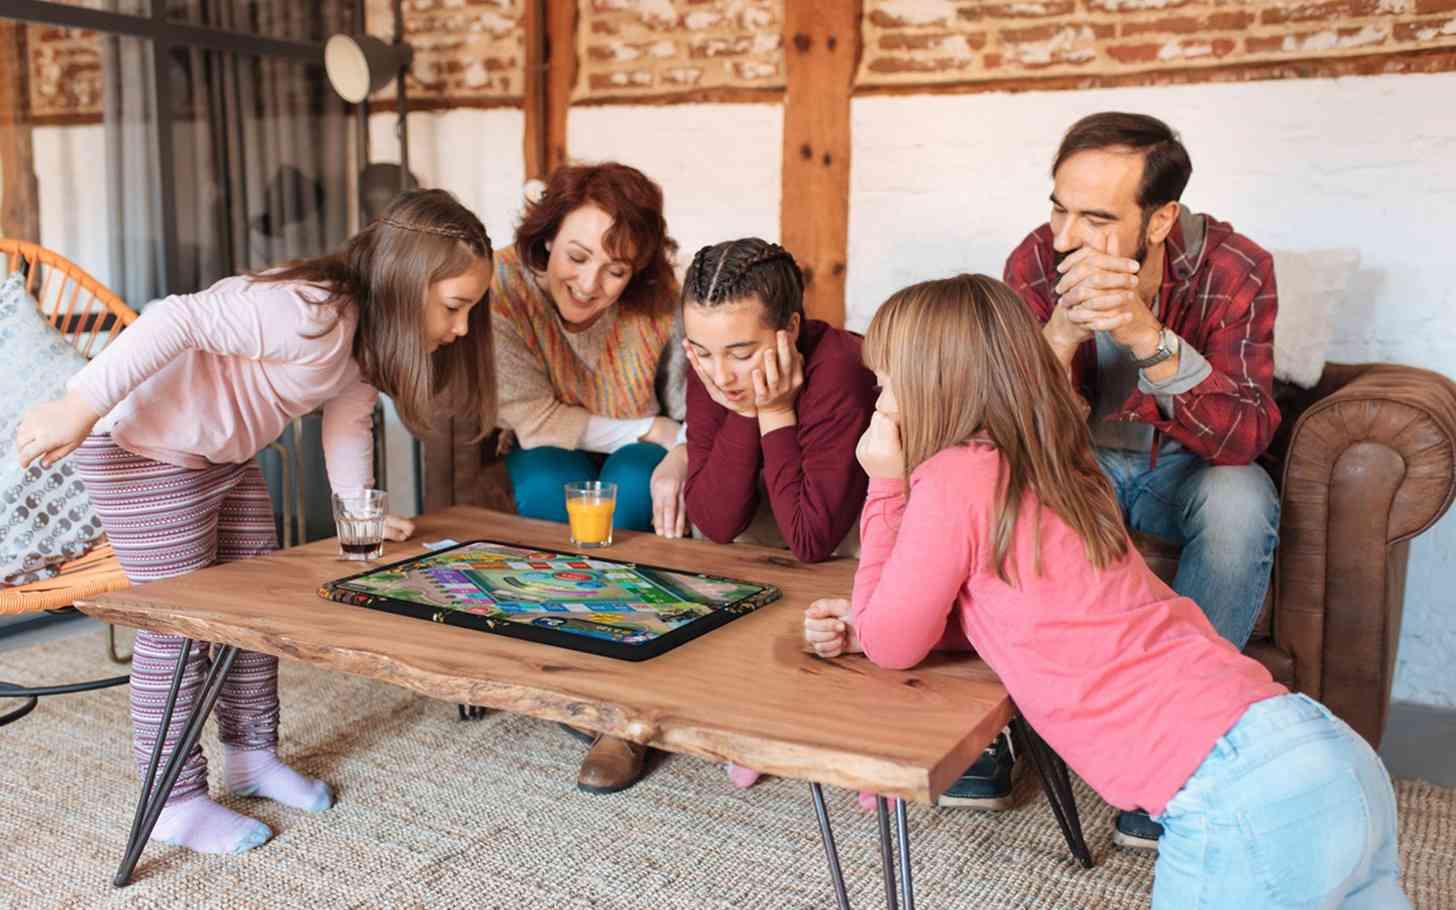 Archos Play Tab tablet